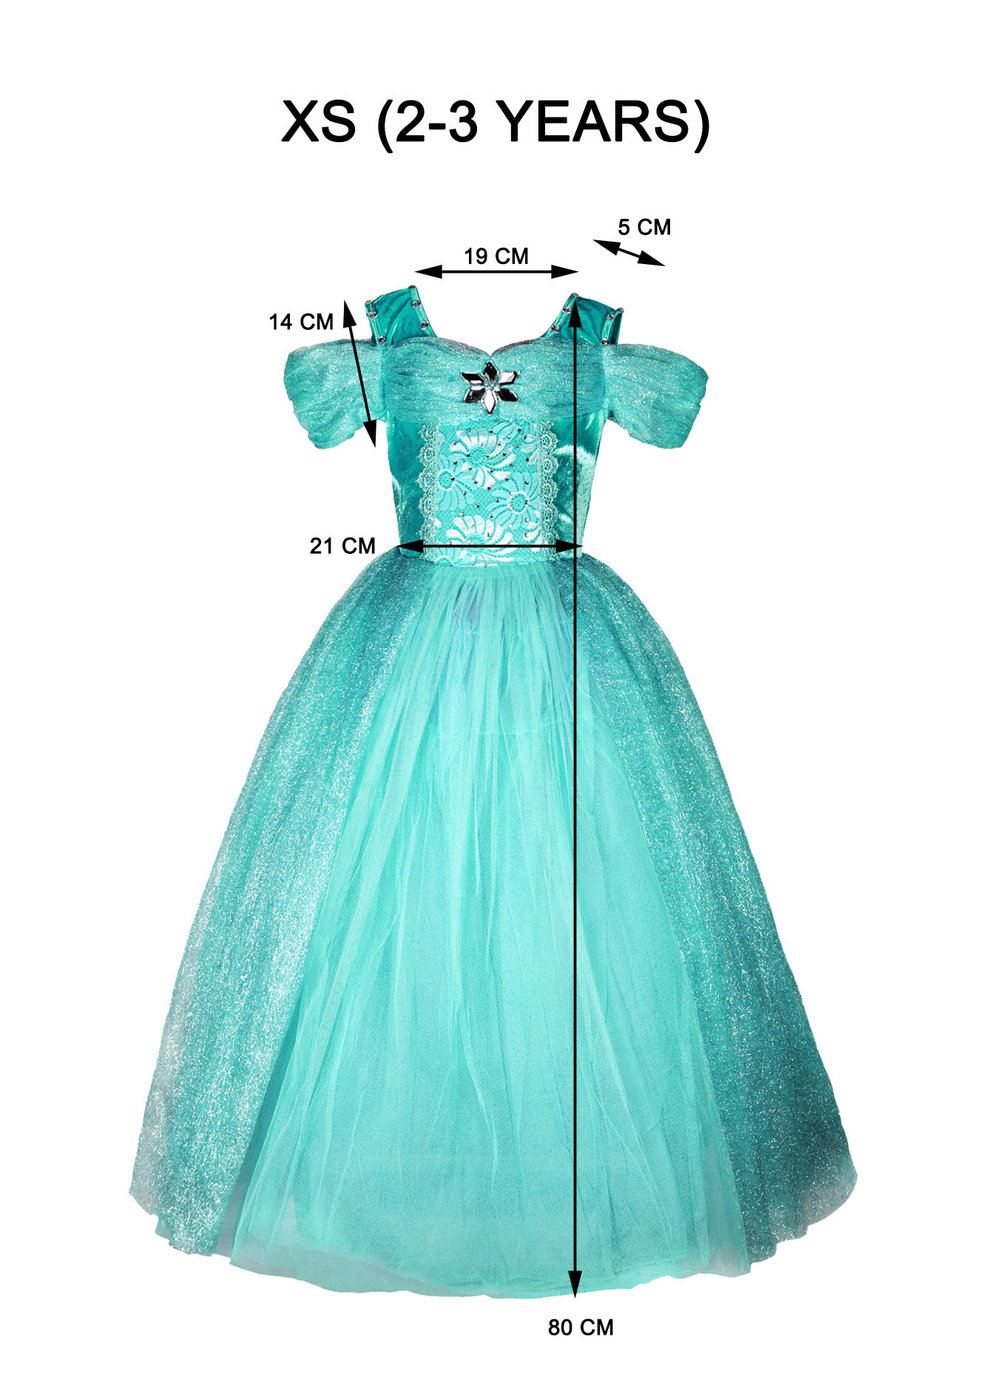 Sparkly Princess Turquoise XS.jpg